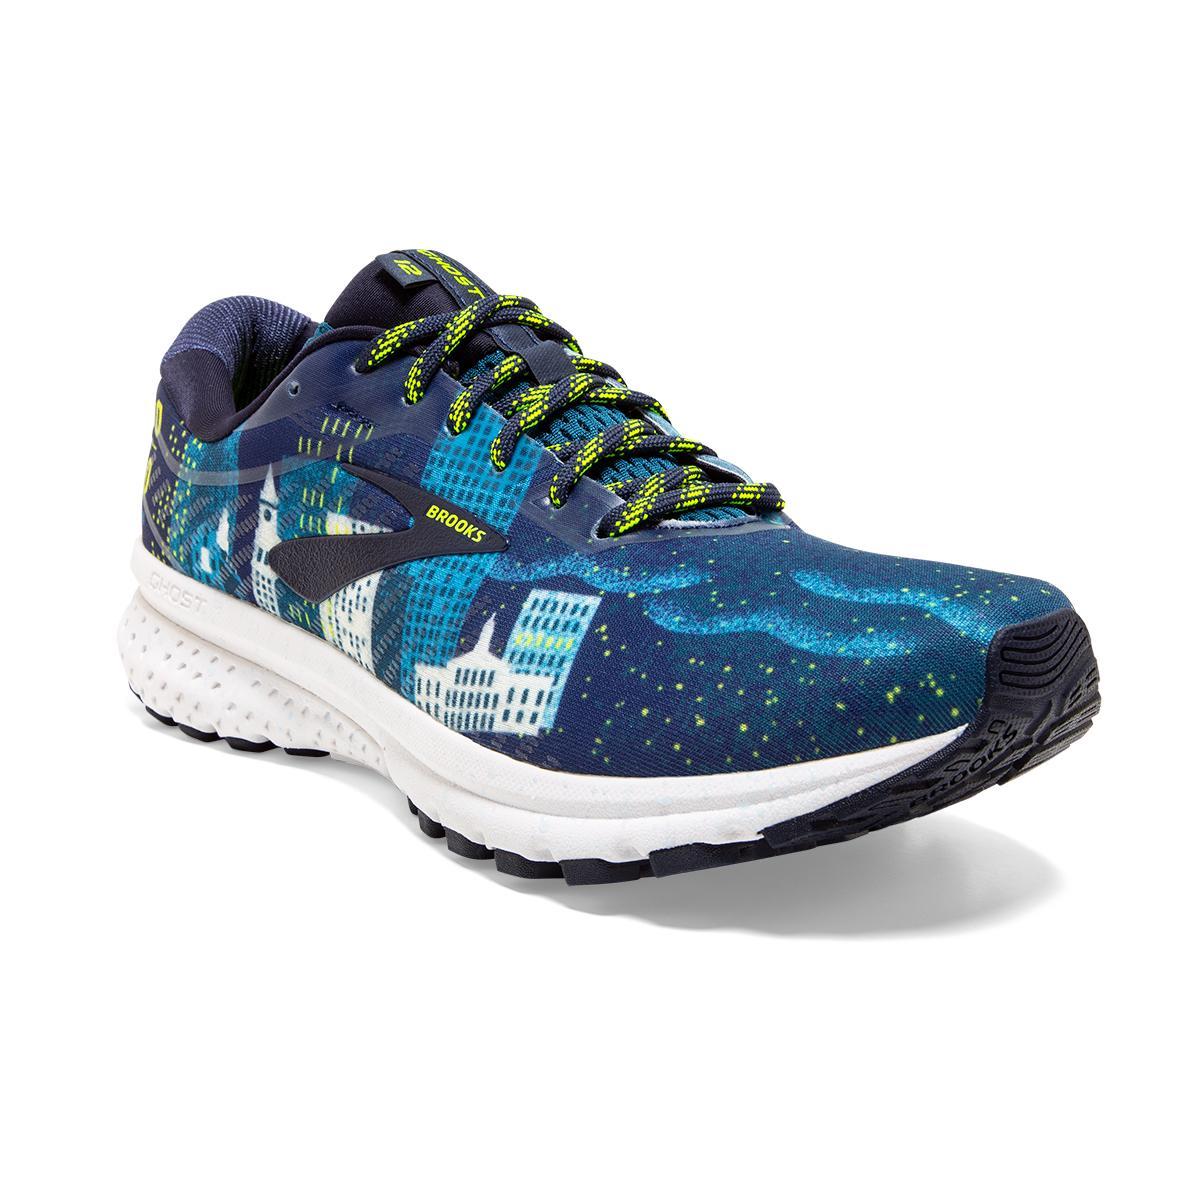 """Brooks Ghost 12 Run Boston Edition"" รองเท้าที่ทำรวมกับงานวิ่งมาราธอนที่เก่าแก่ที่สุดในโลก 05"